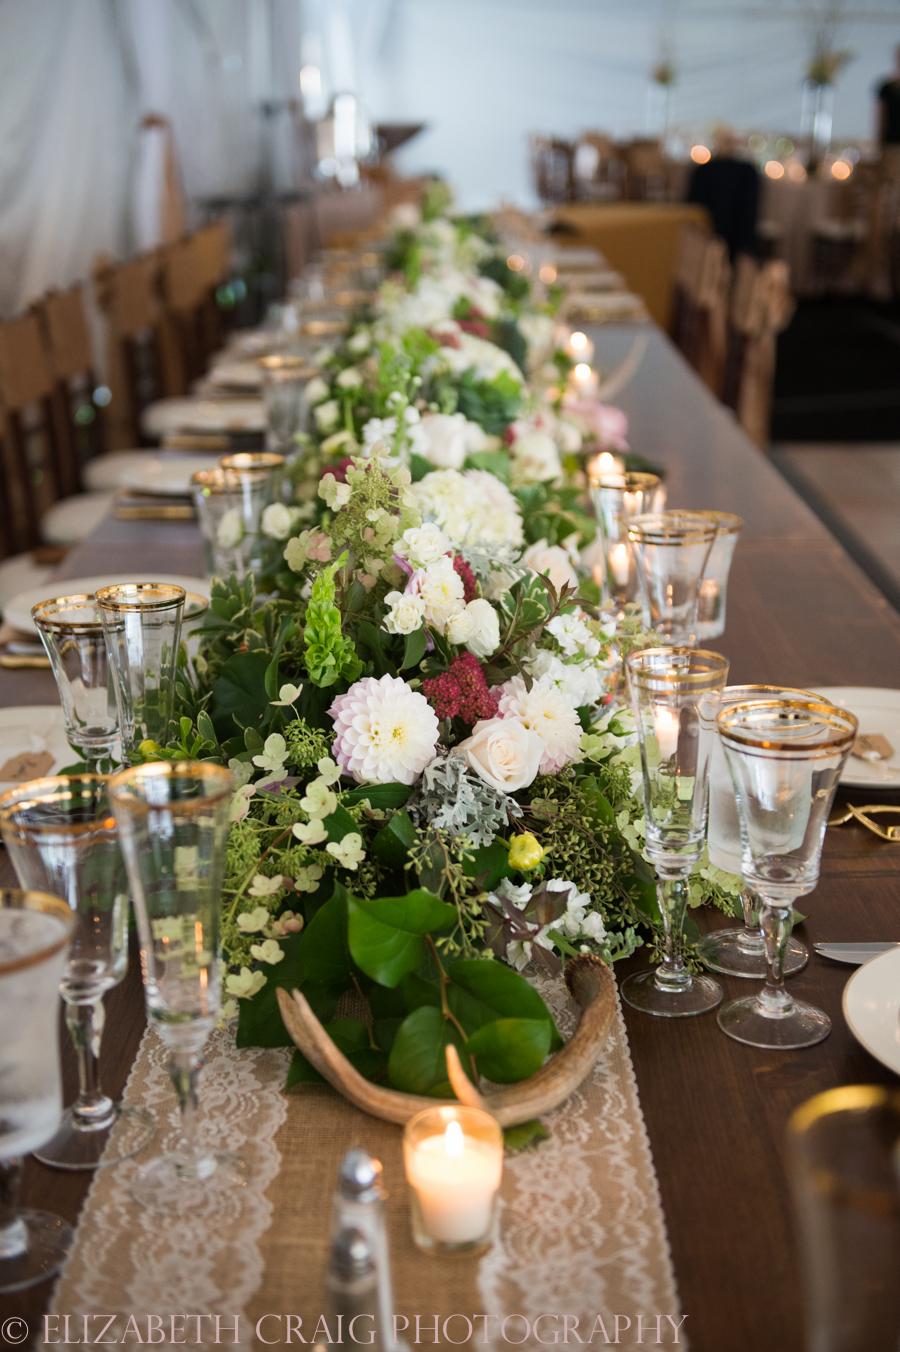 Dubois Brockway St. Marys PA Weddings-0163